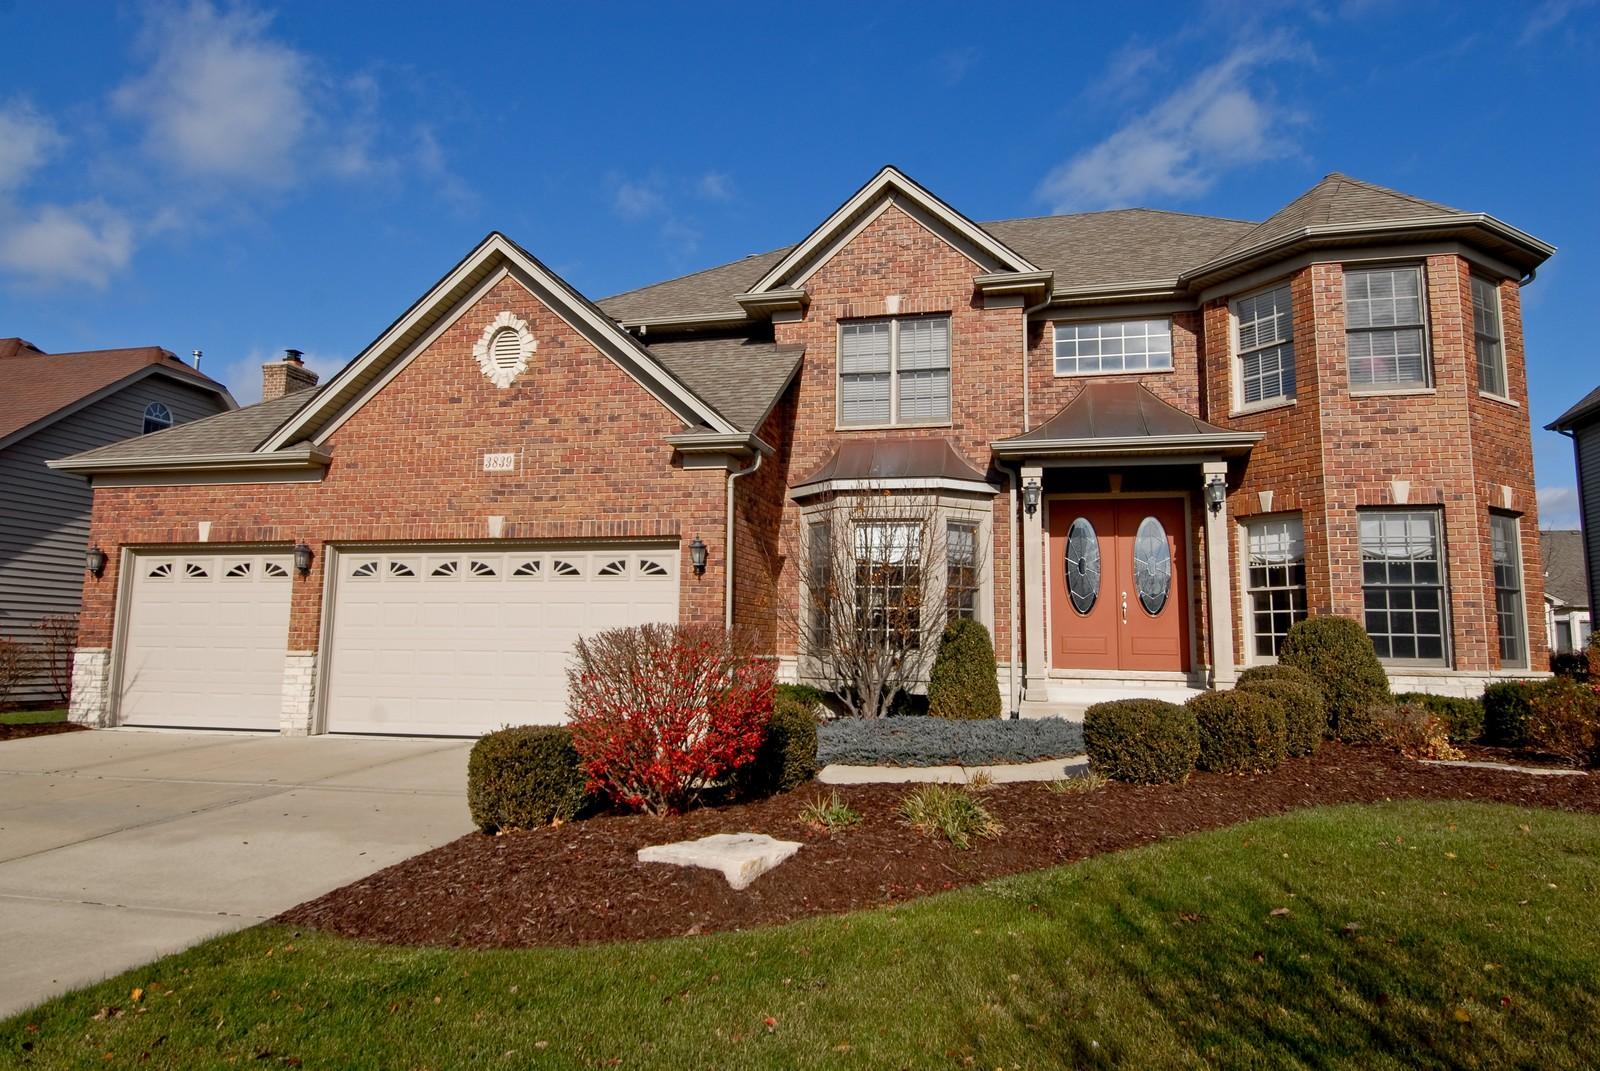 Real Estate Photography - 3839 Junebreeze Ln, Naperville, IL, 60564 - Front View